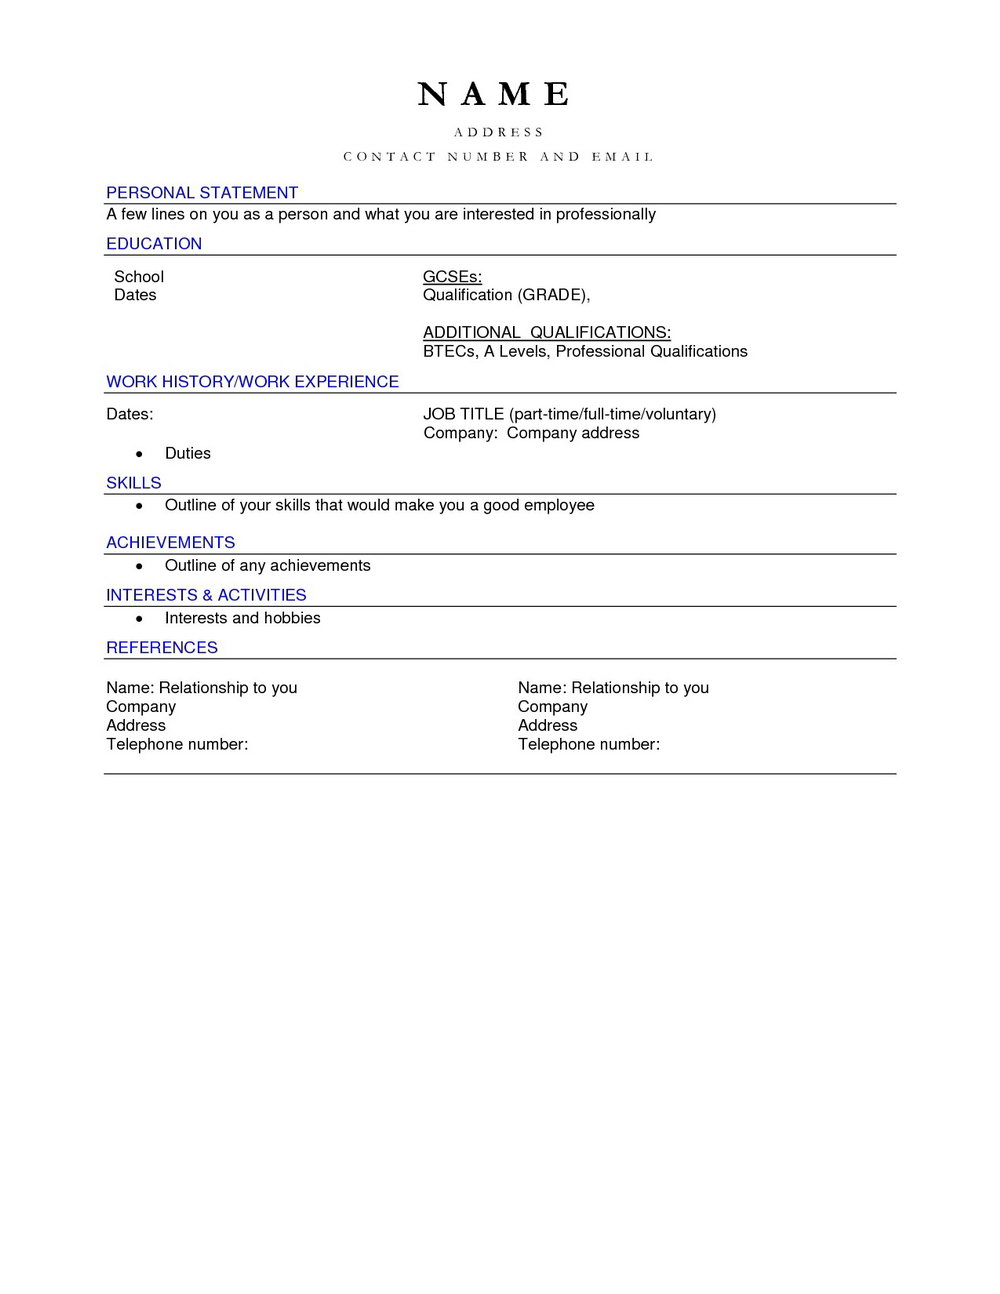 Quick Free Resume Builder Online